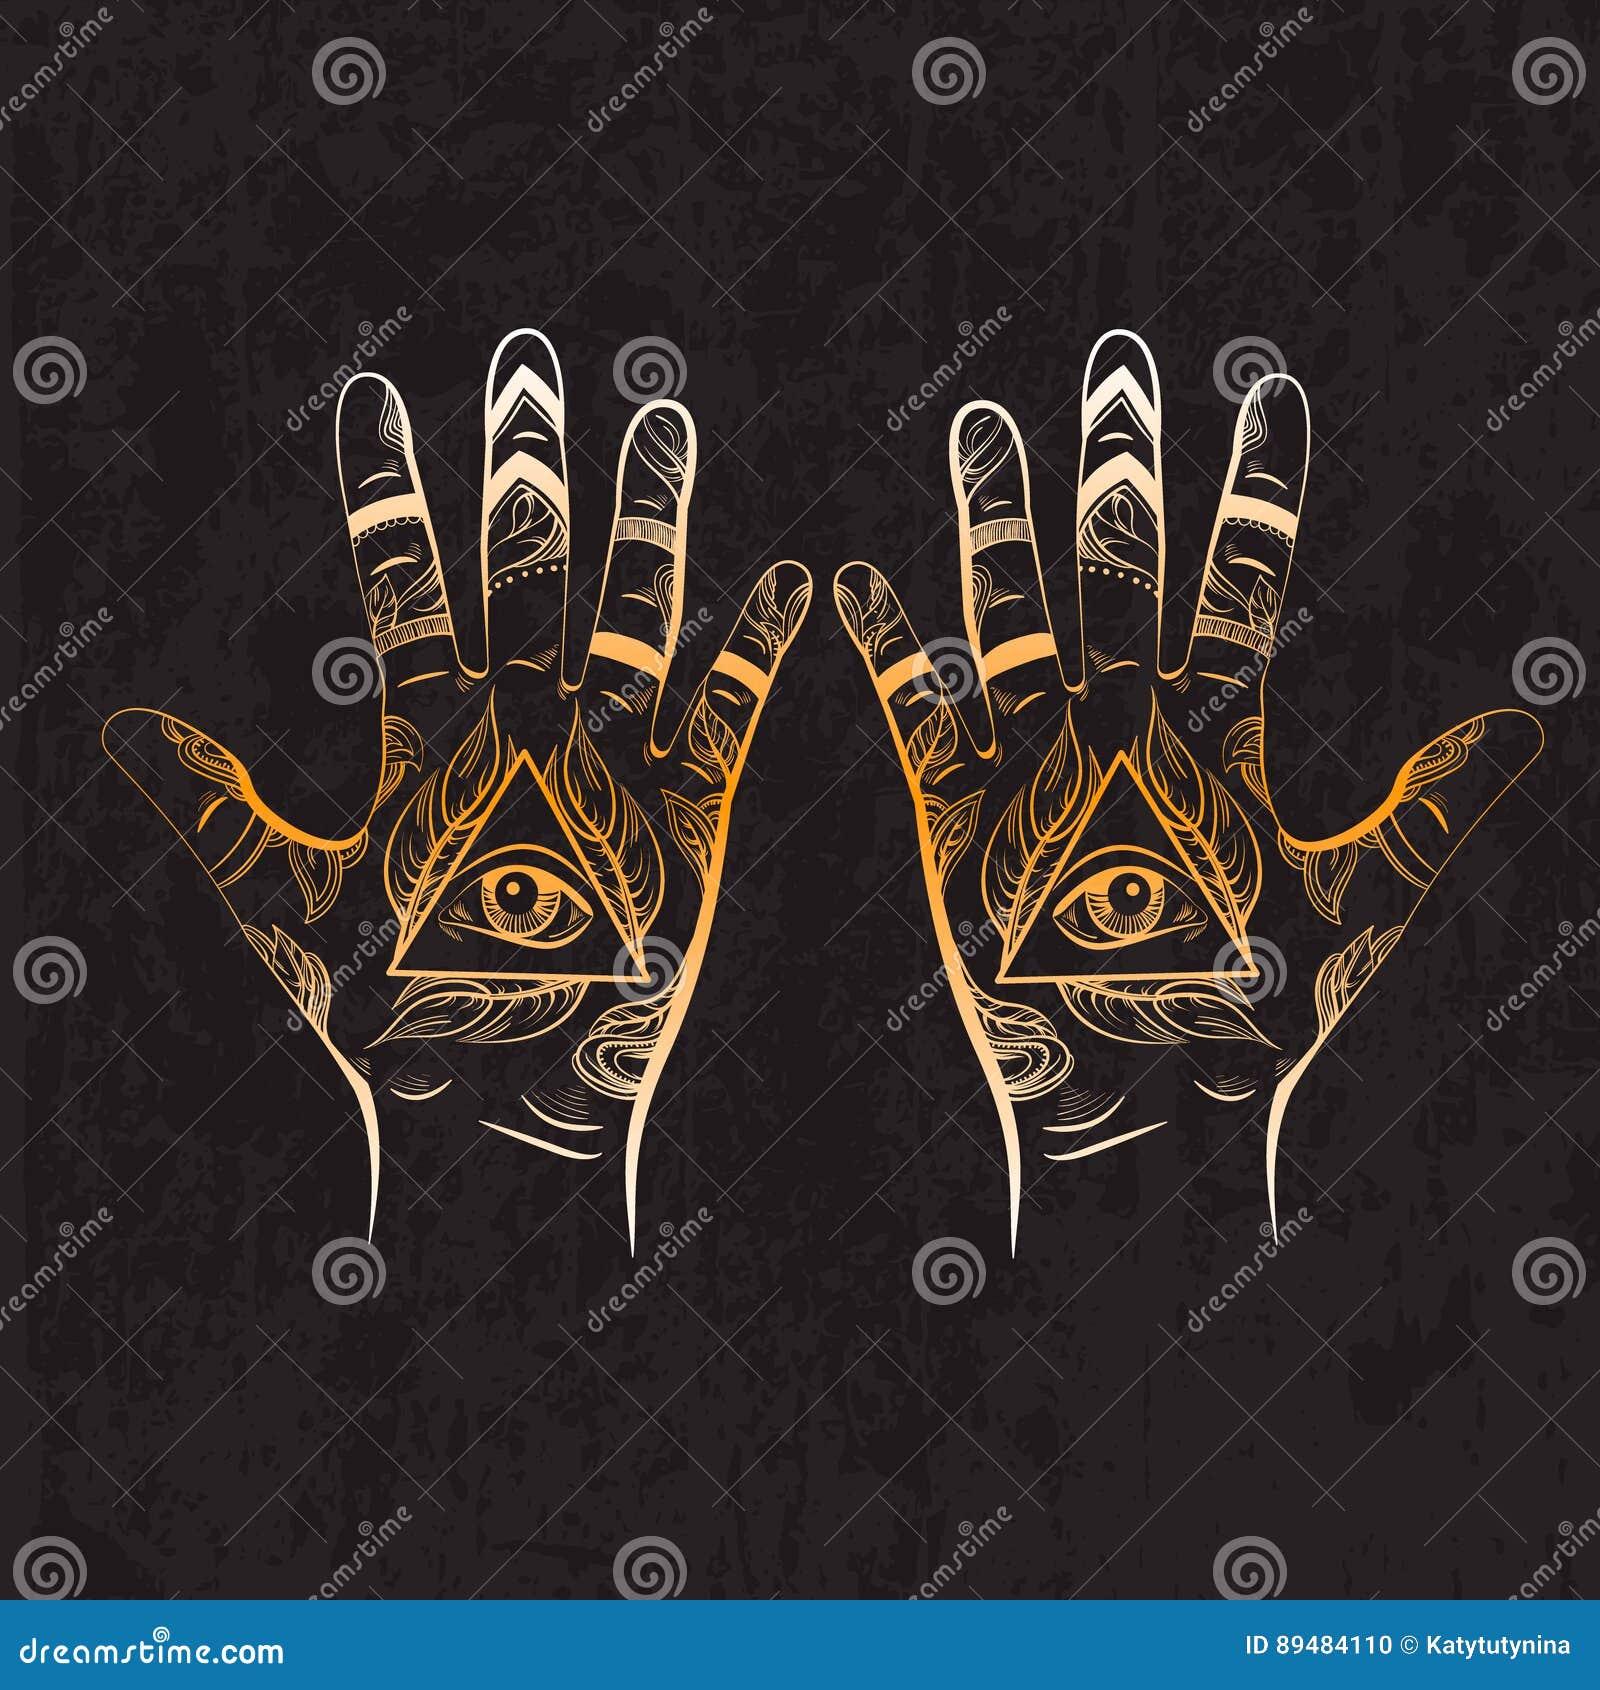 Illusitration του χεριού με όλους που βλέπουν το σύμβολο πυραμίδων ματιών